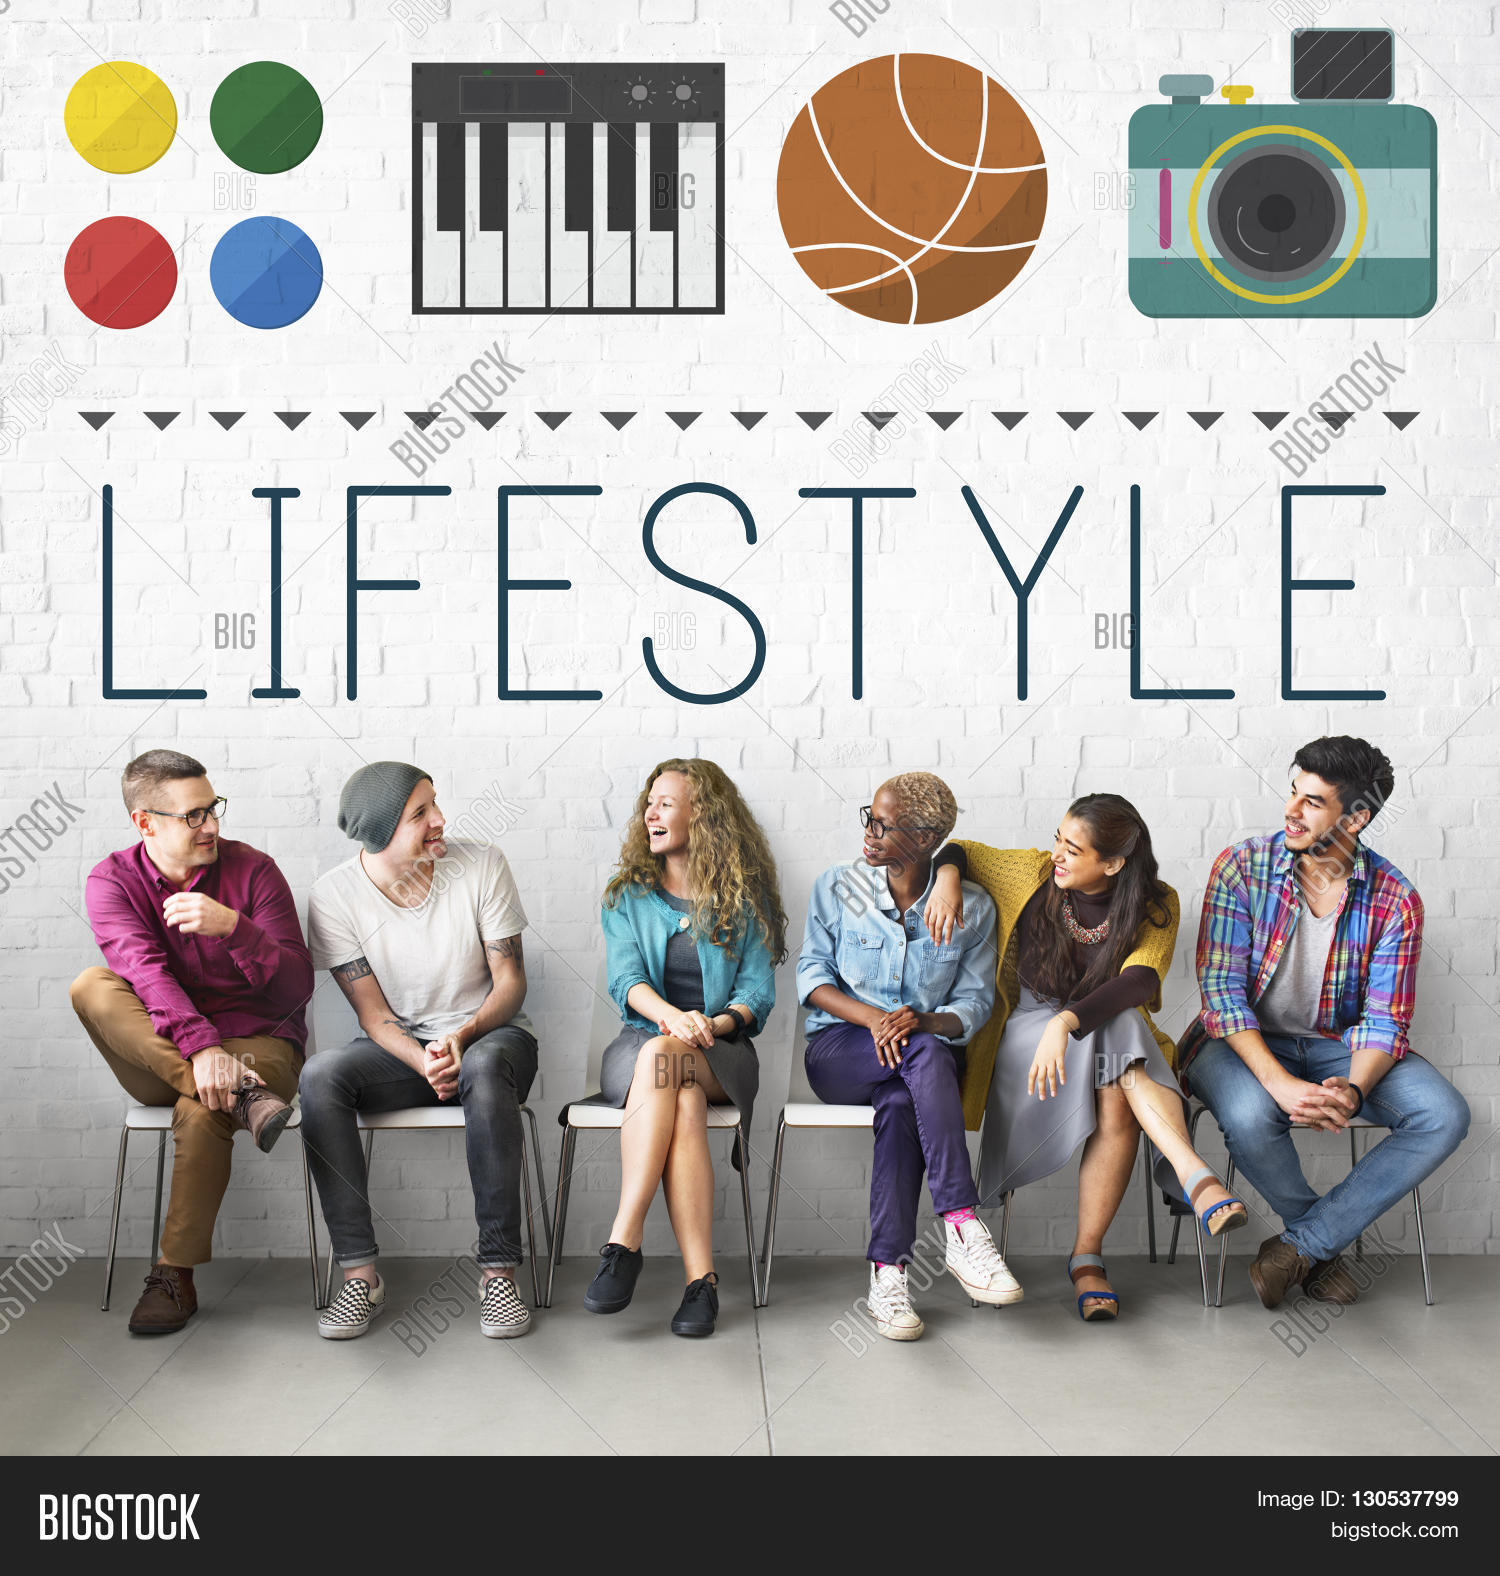 lifestyle culture habits hobbies interests life concept stock lifestyle culture habits hobbies interests life concept